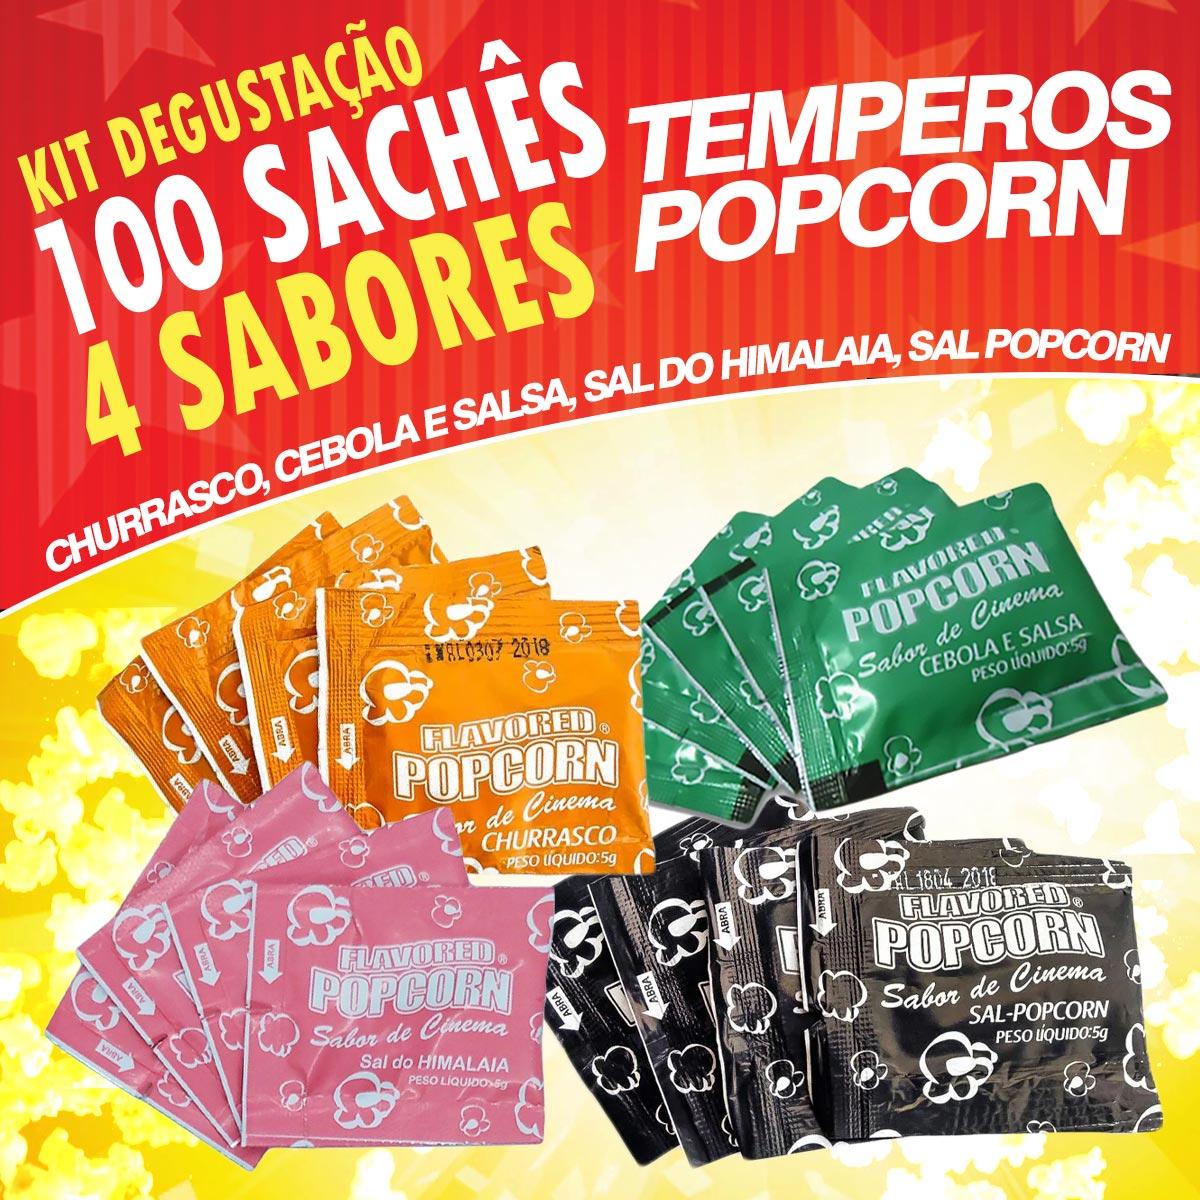 Temperos Popcorn 100 sachês. 25 Churrasco, 25 Cebola e Salsa, 25 Sal do Himalaia e 25 Sal Popcorn